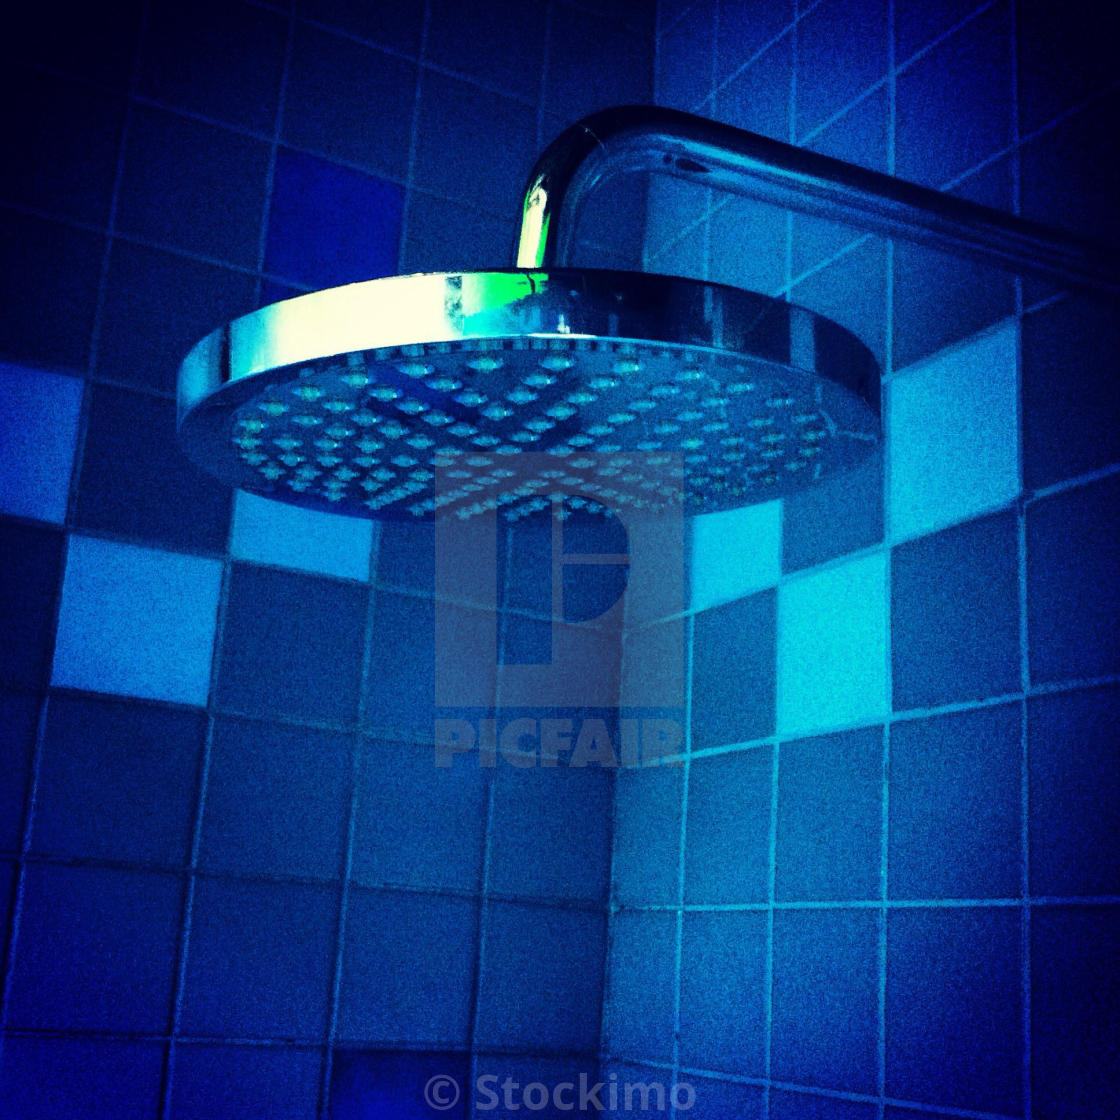 Blue Shower Head Rain Shower In Blue Bathroom License